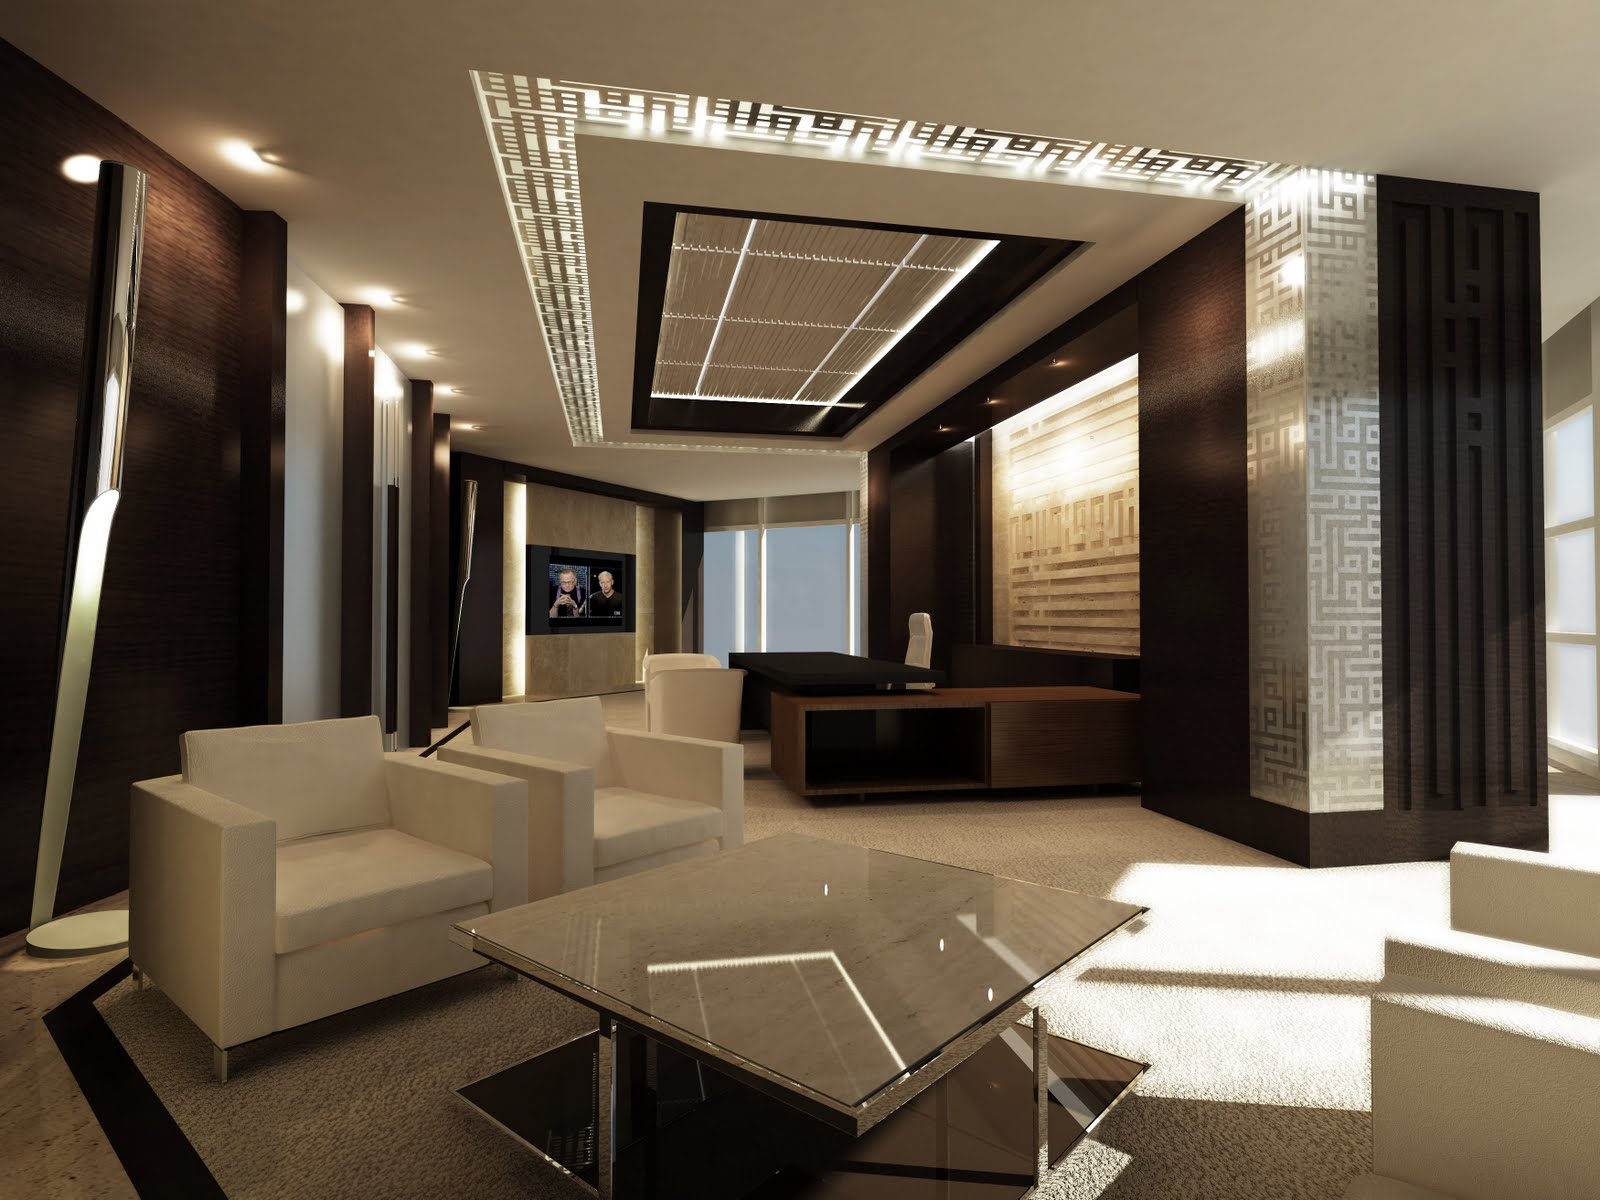 Interior Design Office: Tawazen Interior Design L.L.C: July 2011